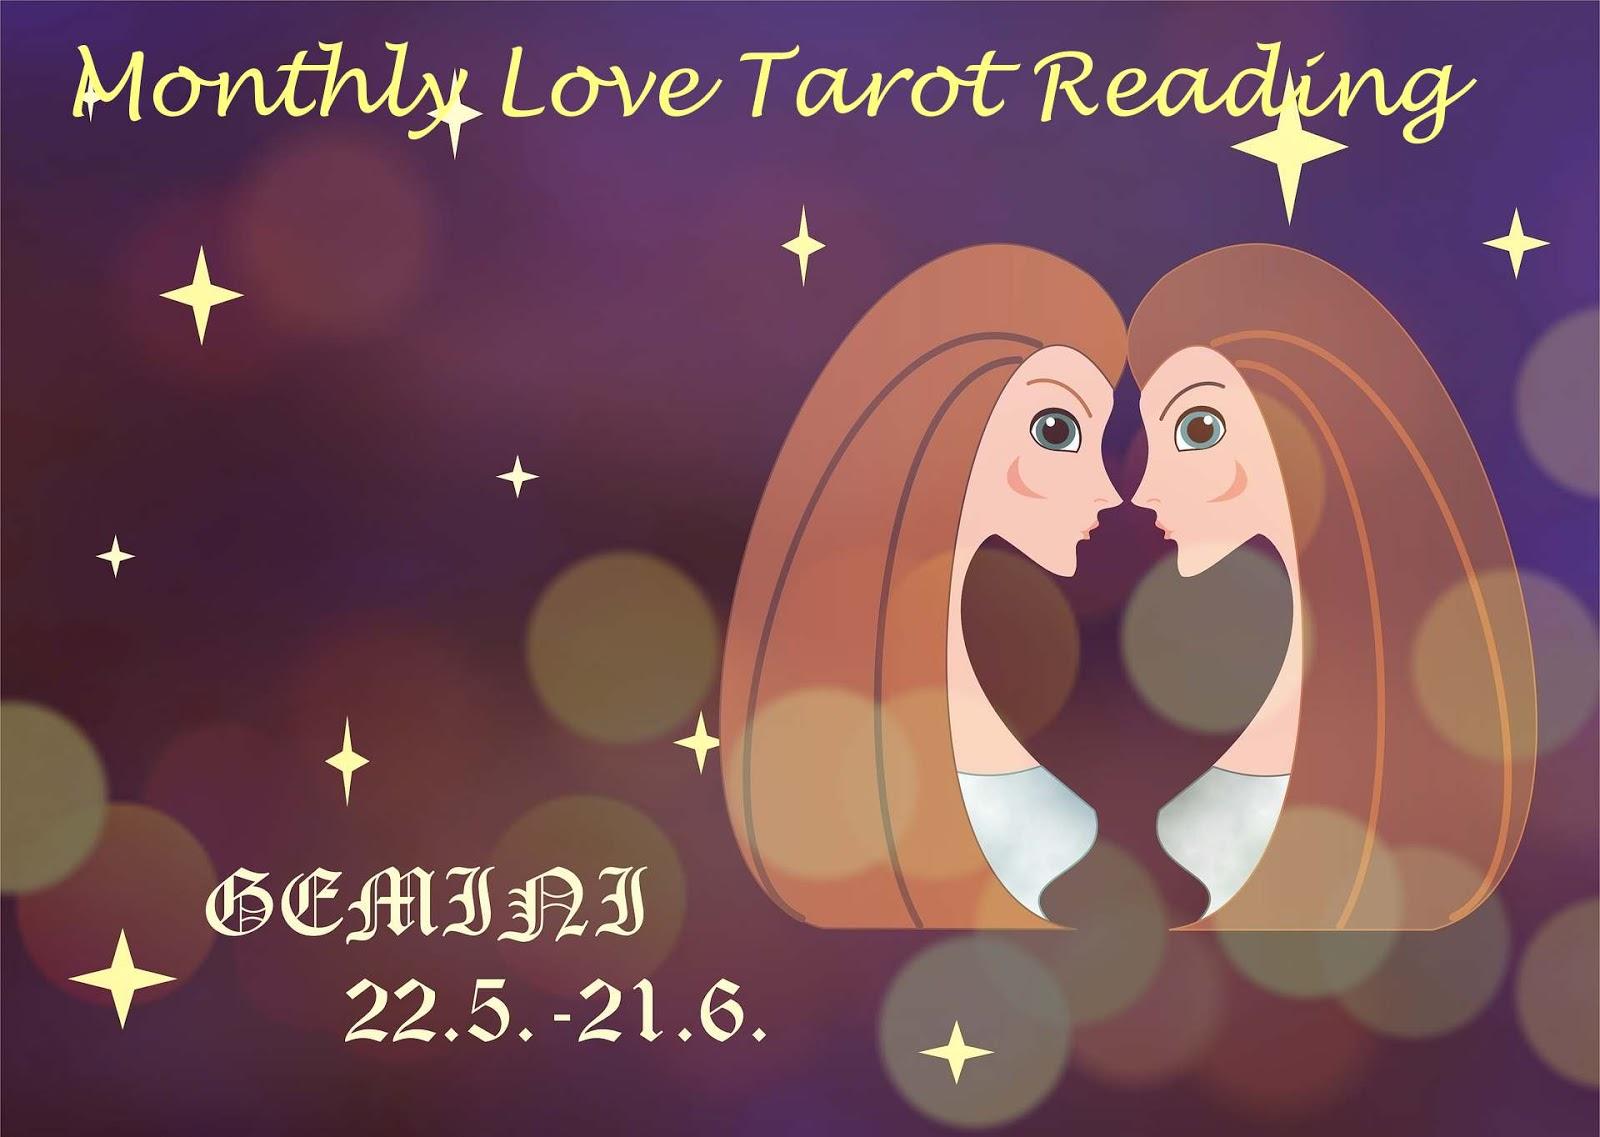 Gemini ♊ - Love Tarot Reading October 2017 Dreams come true